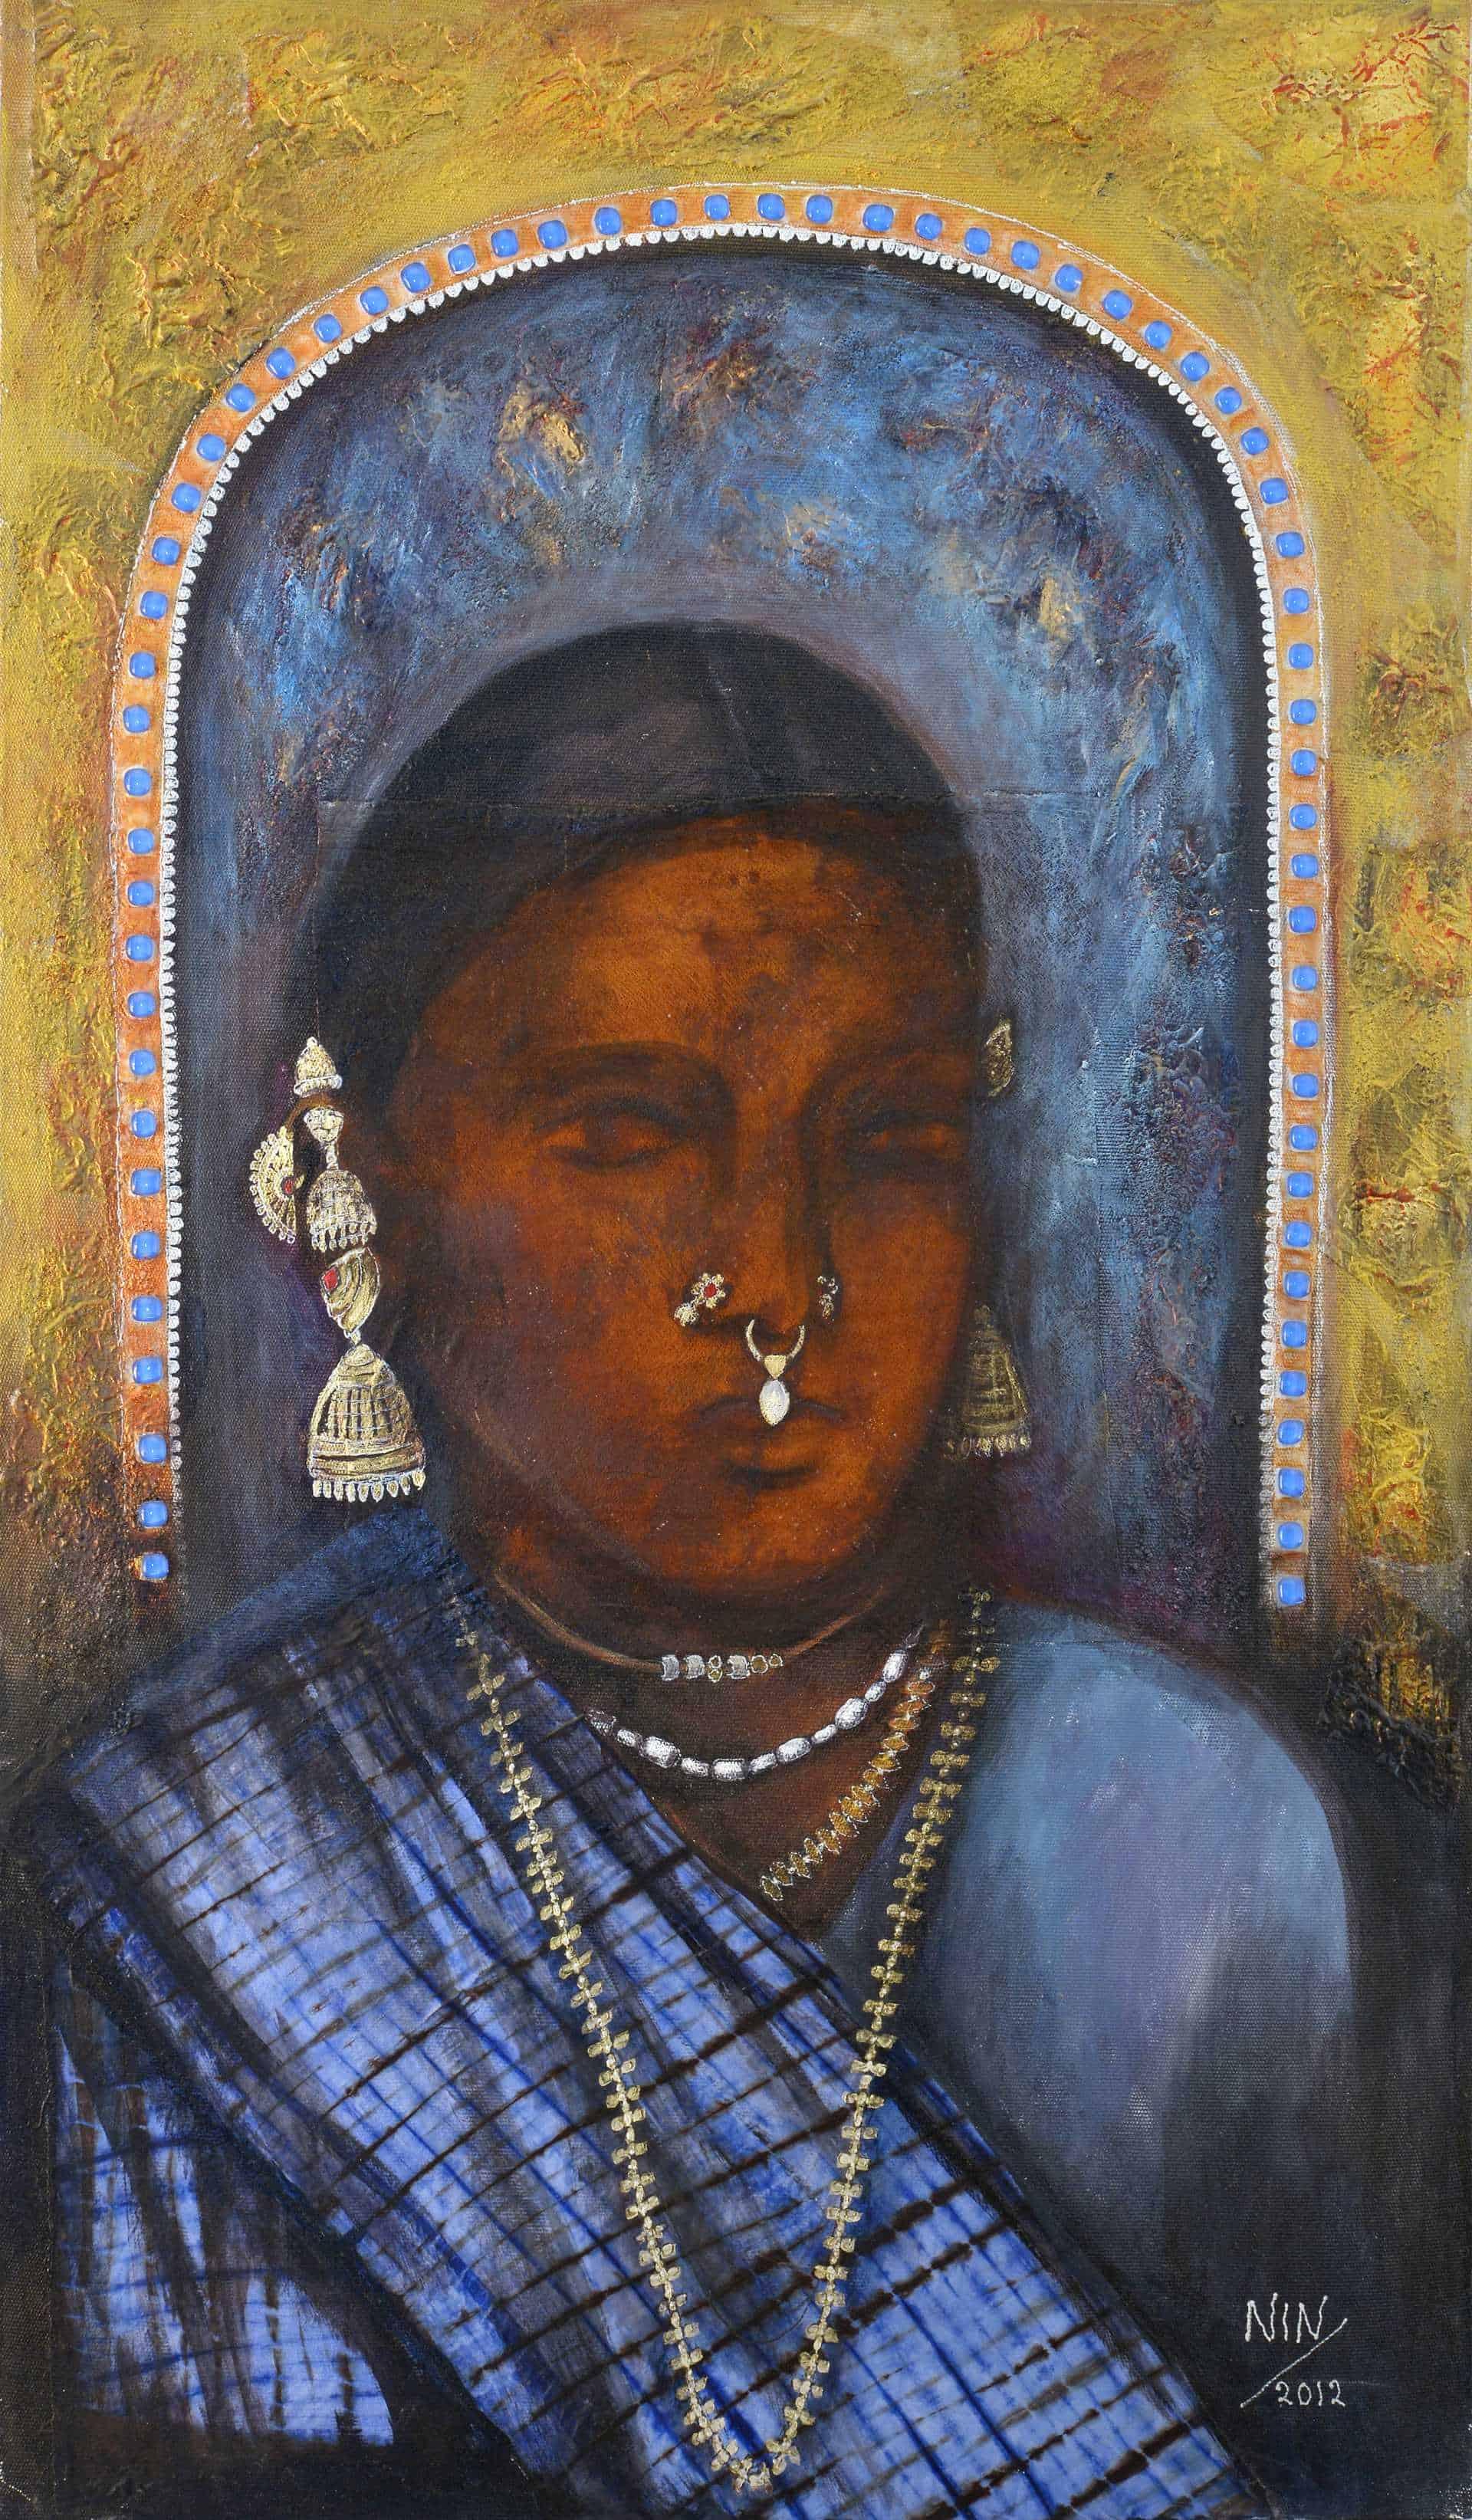 nalini-treebhoobun-mauritian-artist-woman-from-andrapradesh